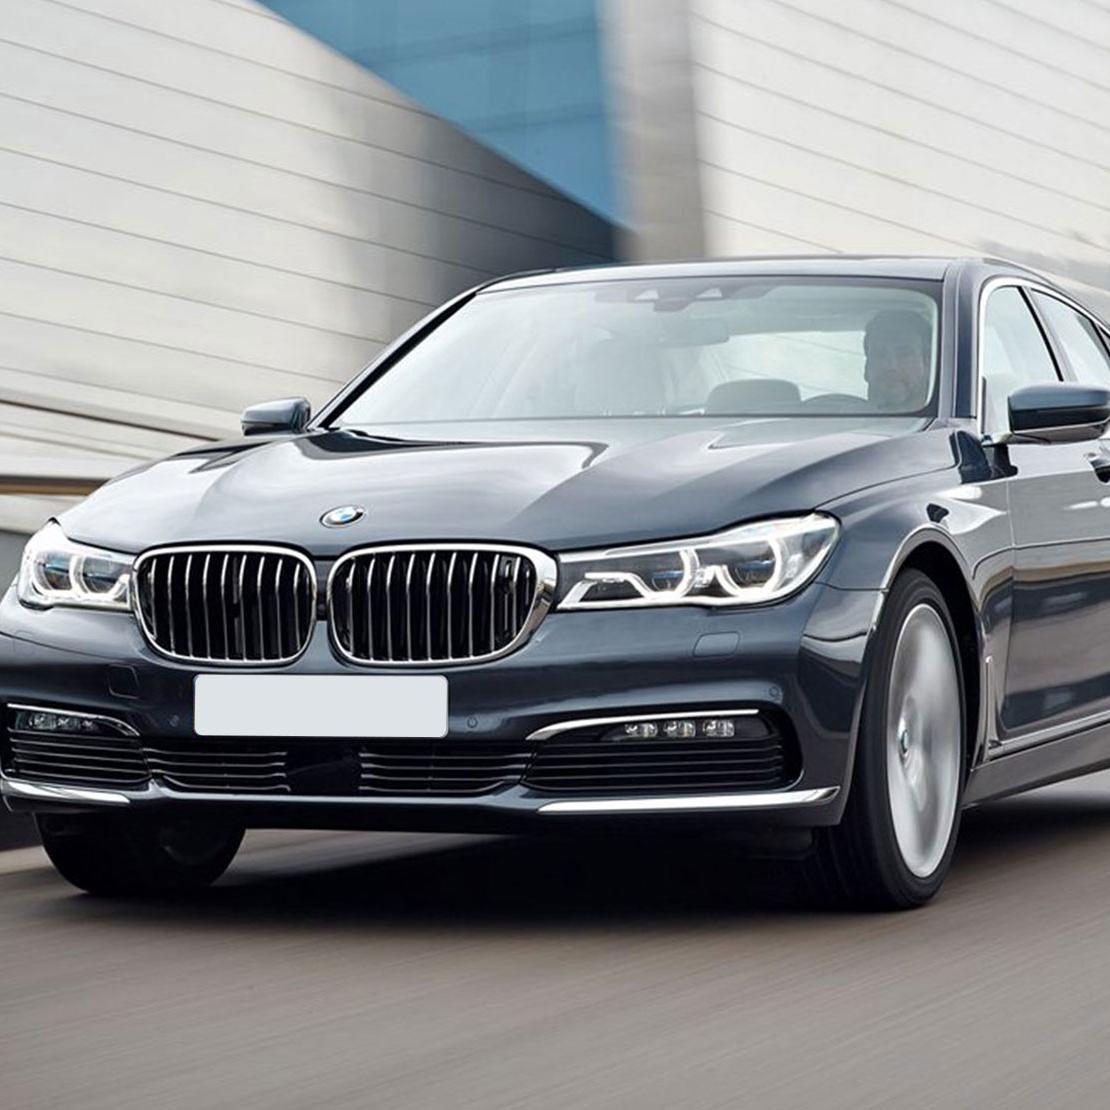 KESTAUTO – specializuotas BMW autoservisas Vilniuje. BMW servisas, remontas, kompiuterinė diagnostika, dalys.